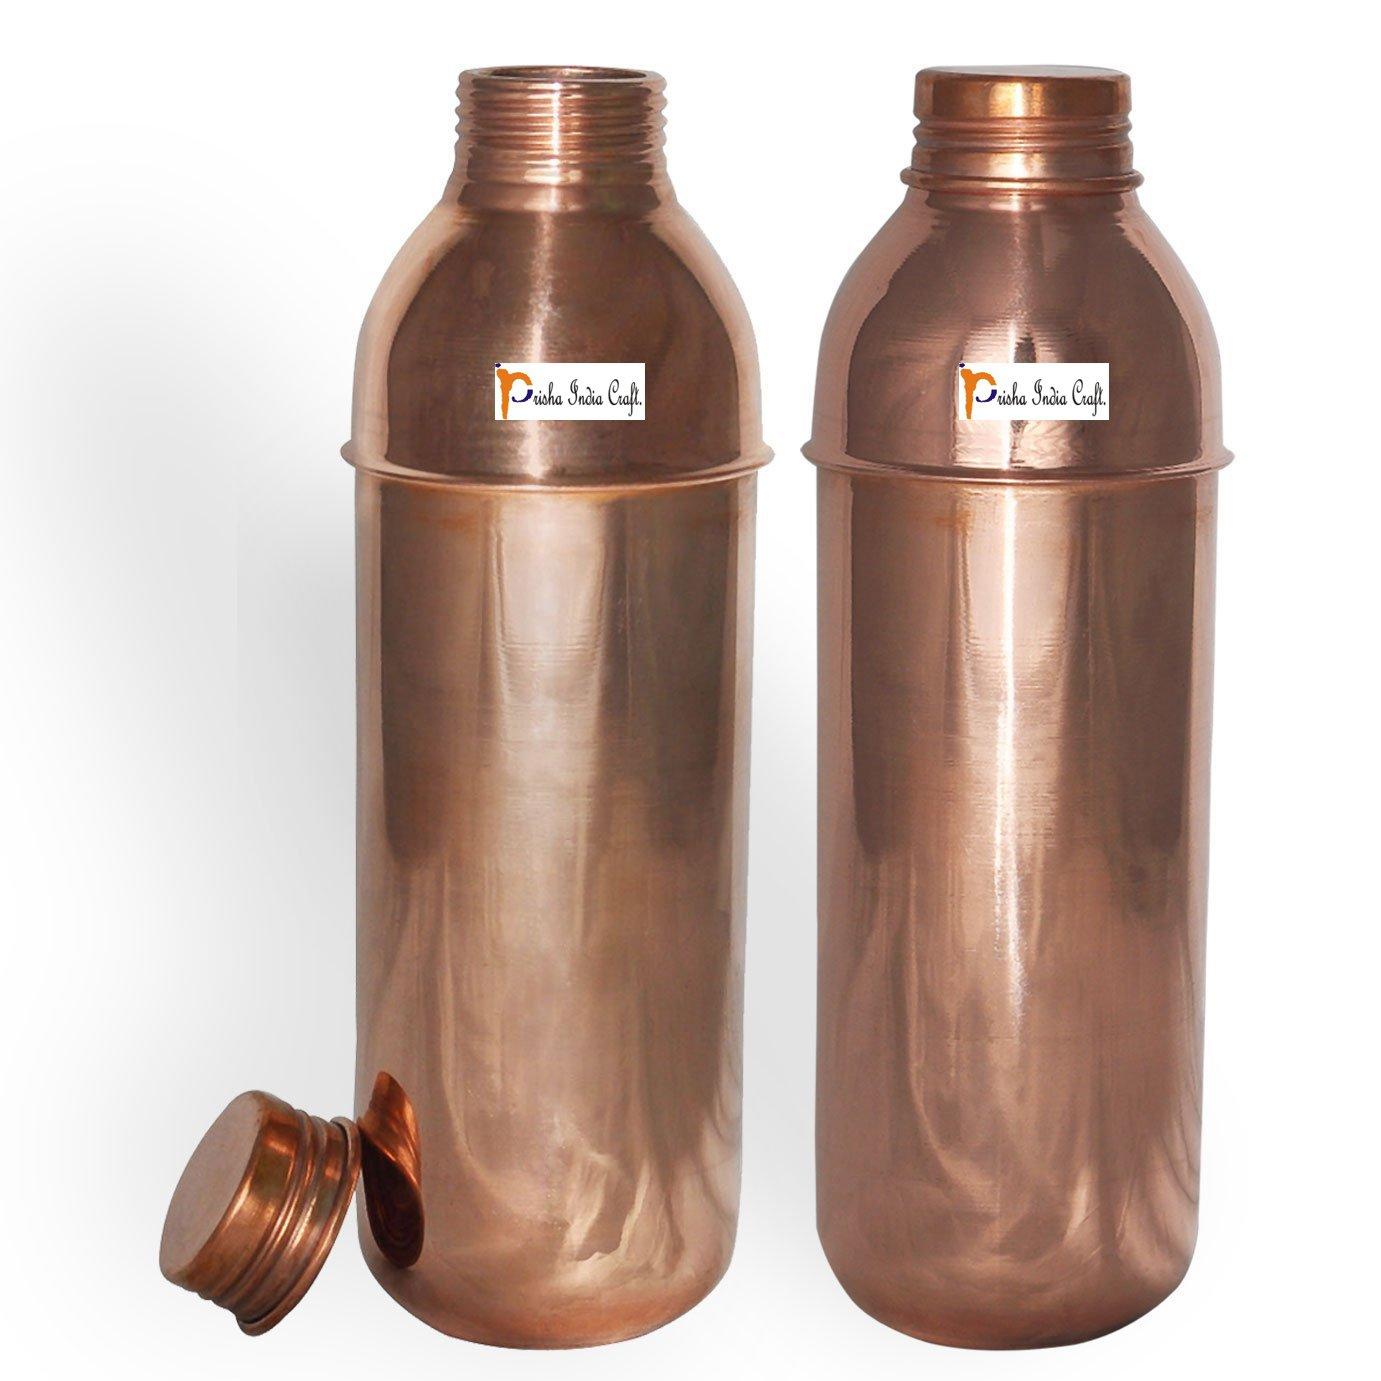 Prisha India Craft (Set of 2) Copper New Bislery Stylish Bottle with Ayurvedic benefited - 800 ML / 27 oz Thermos Bottles - 100% Genuine Copper Water Bottles